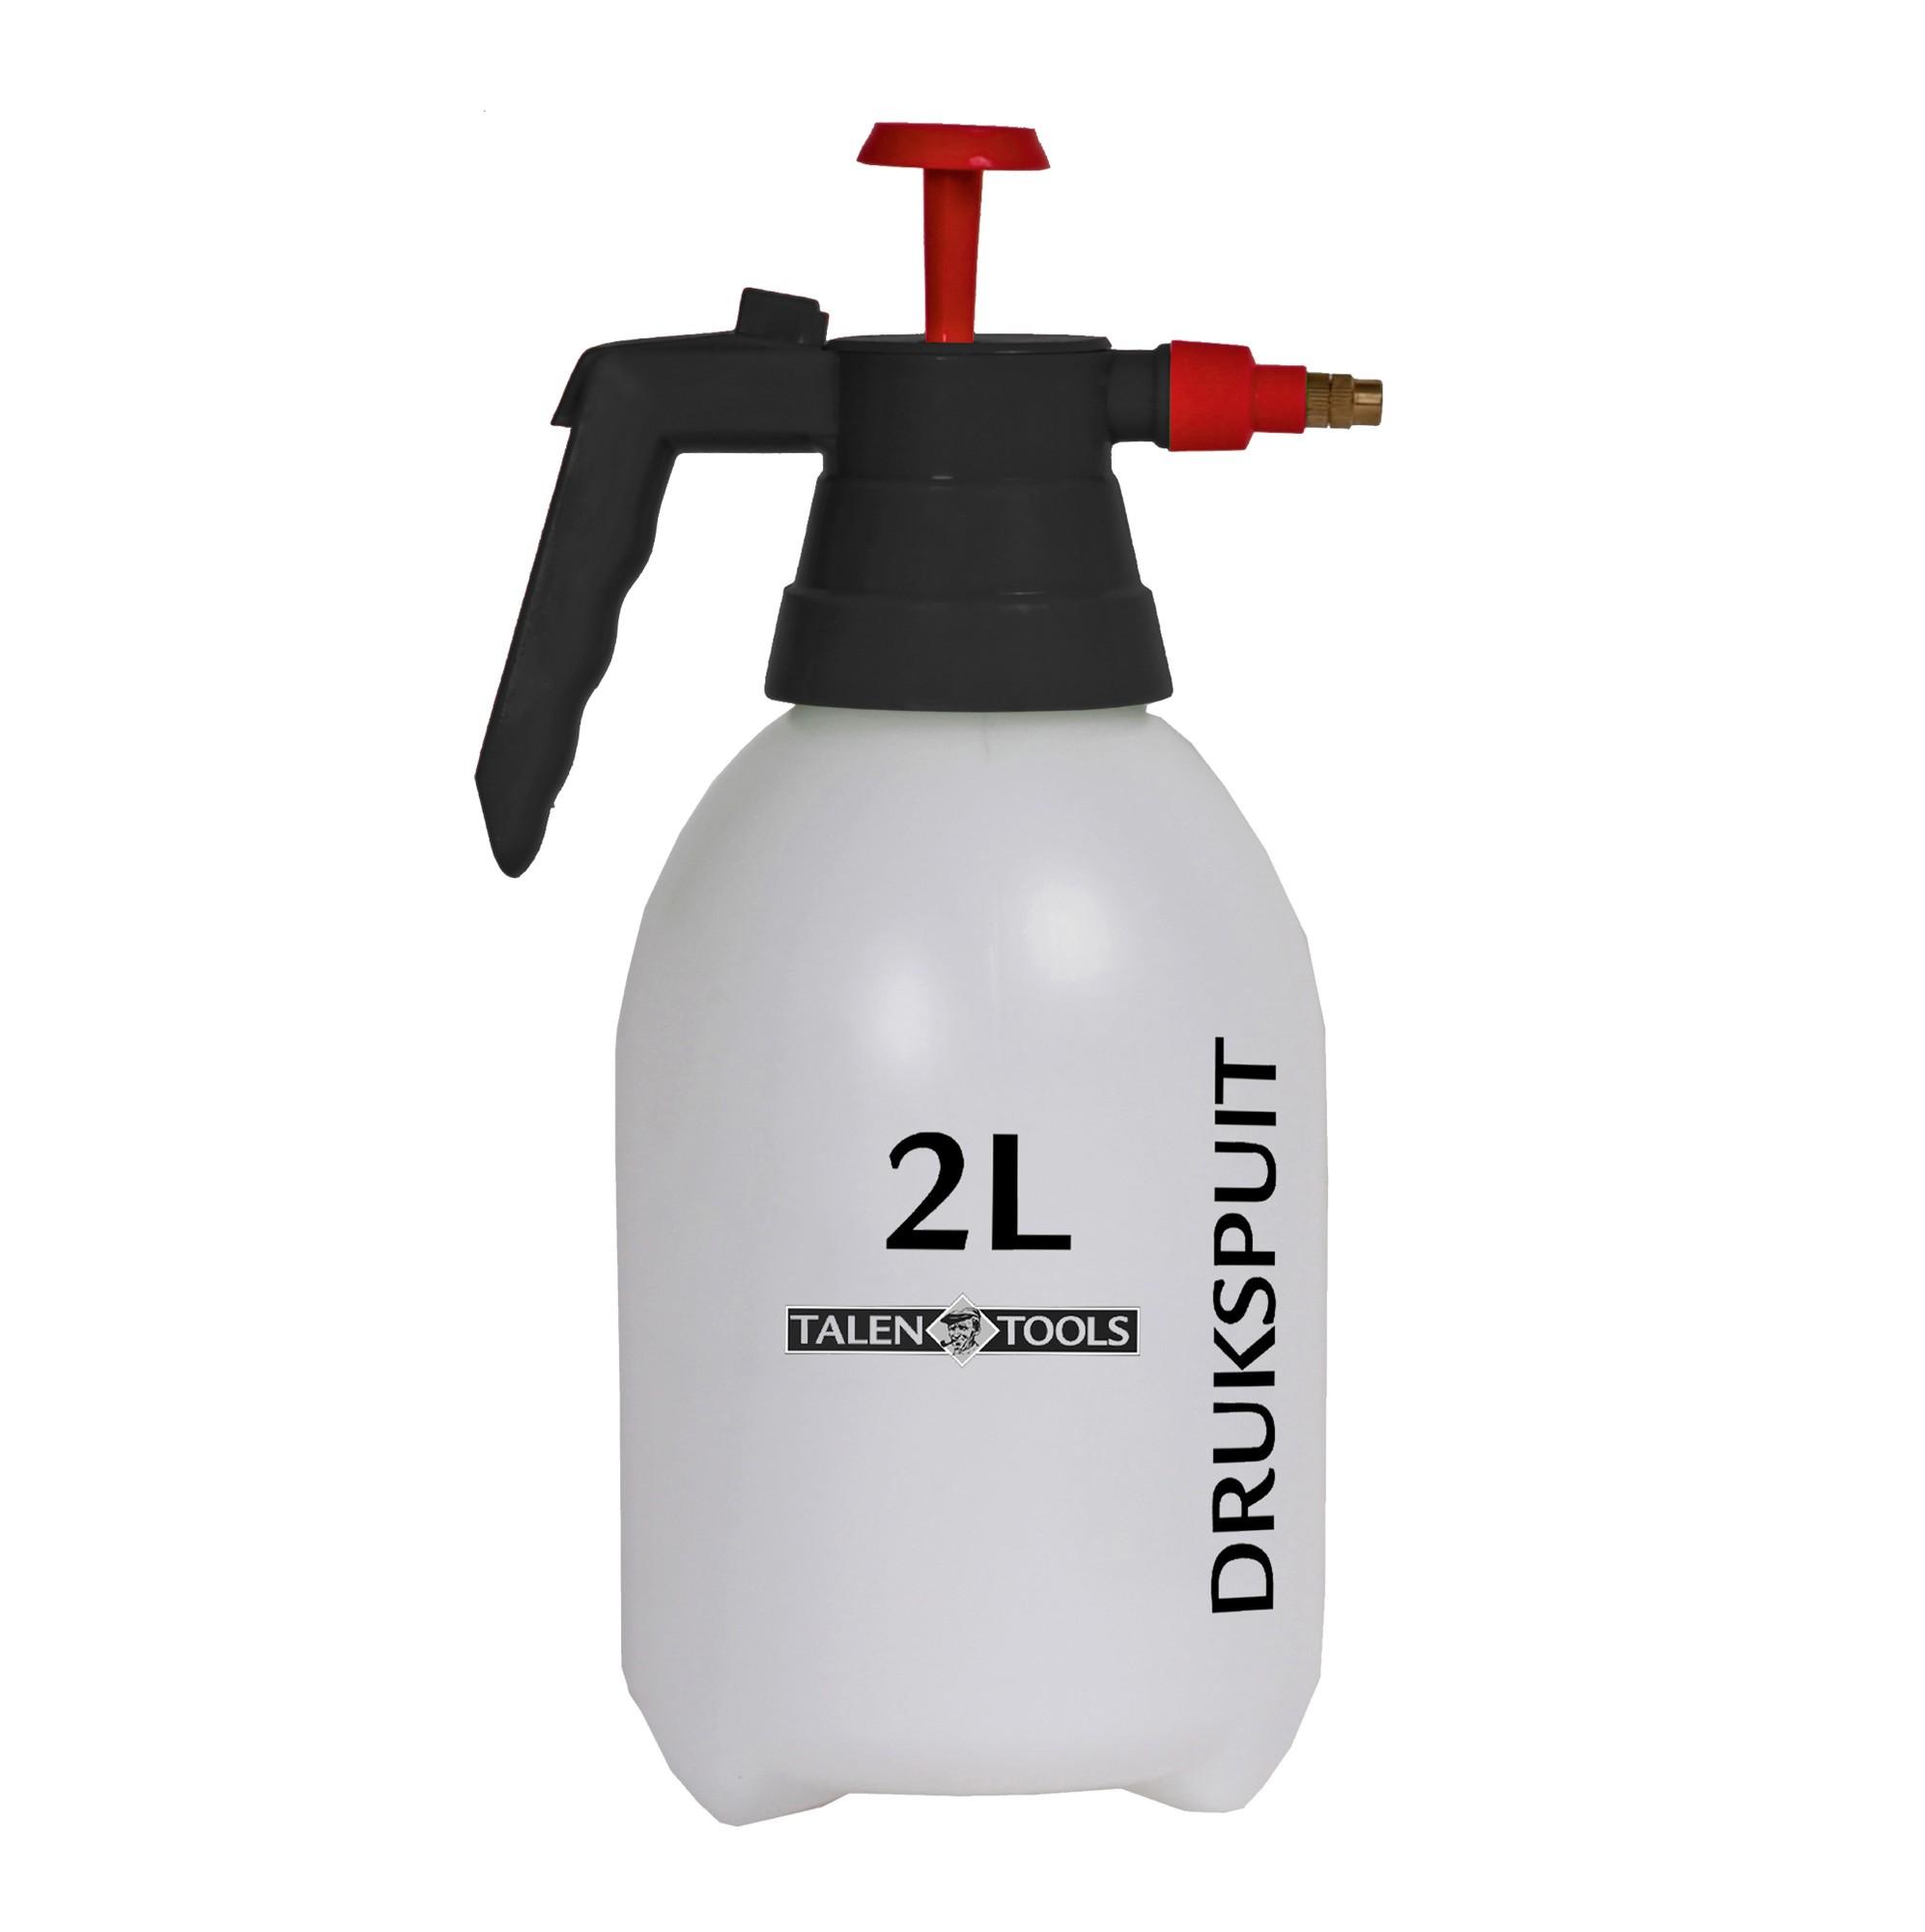 Drukspuit 2 liter